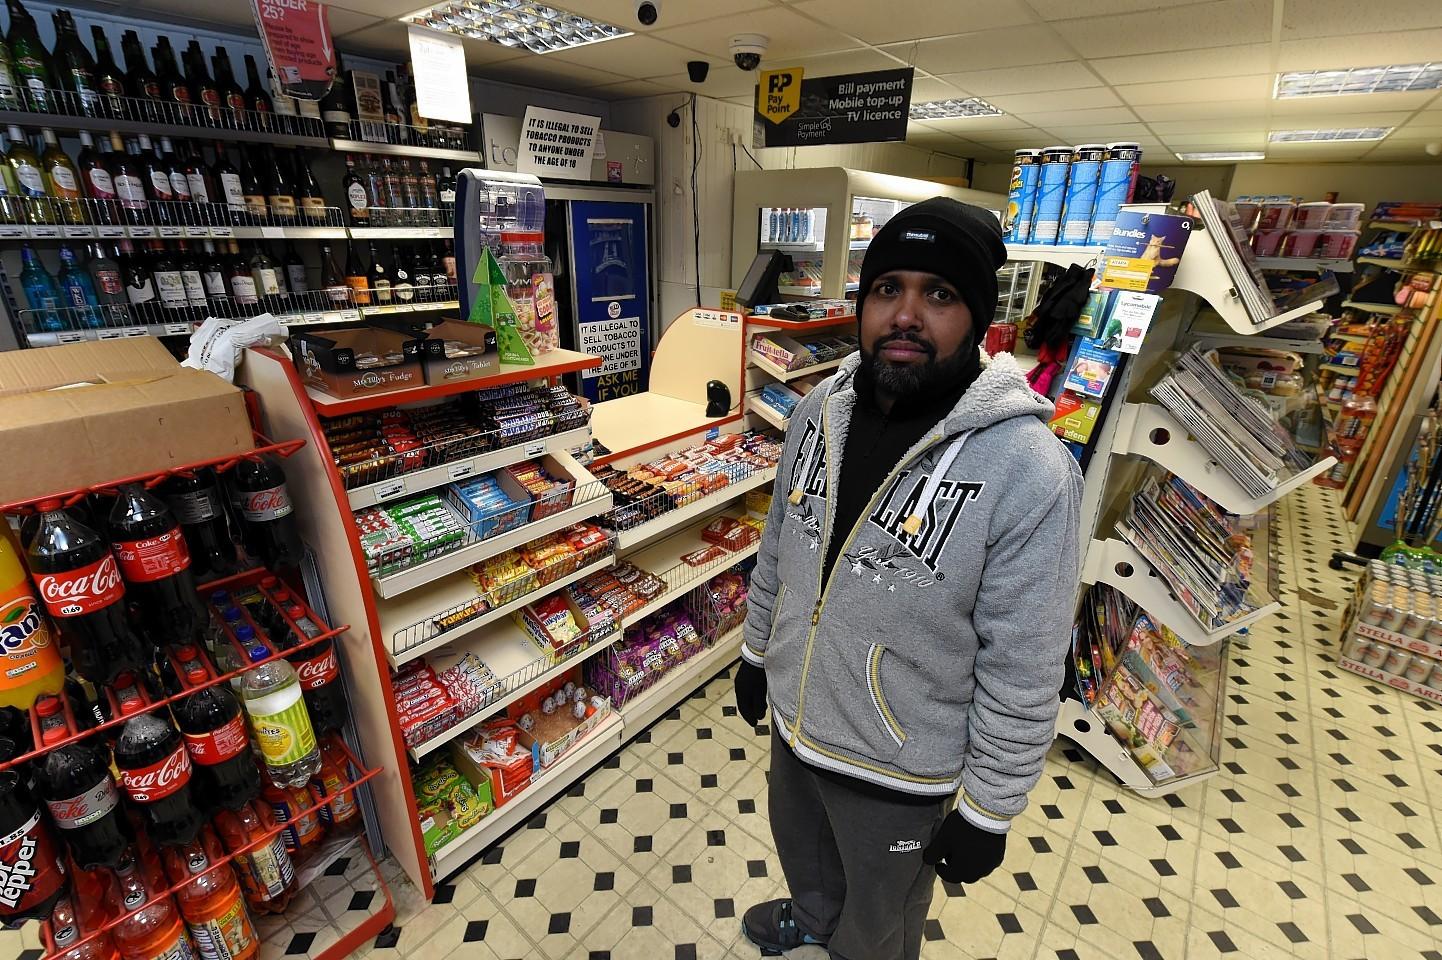 Urquhart Road shop owner Thengavelavthem Sivakmur